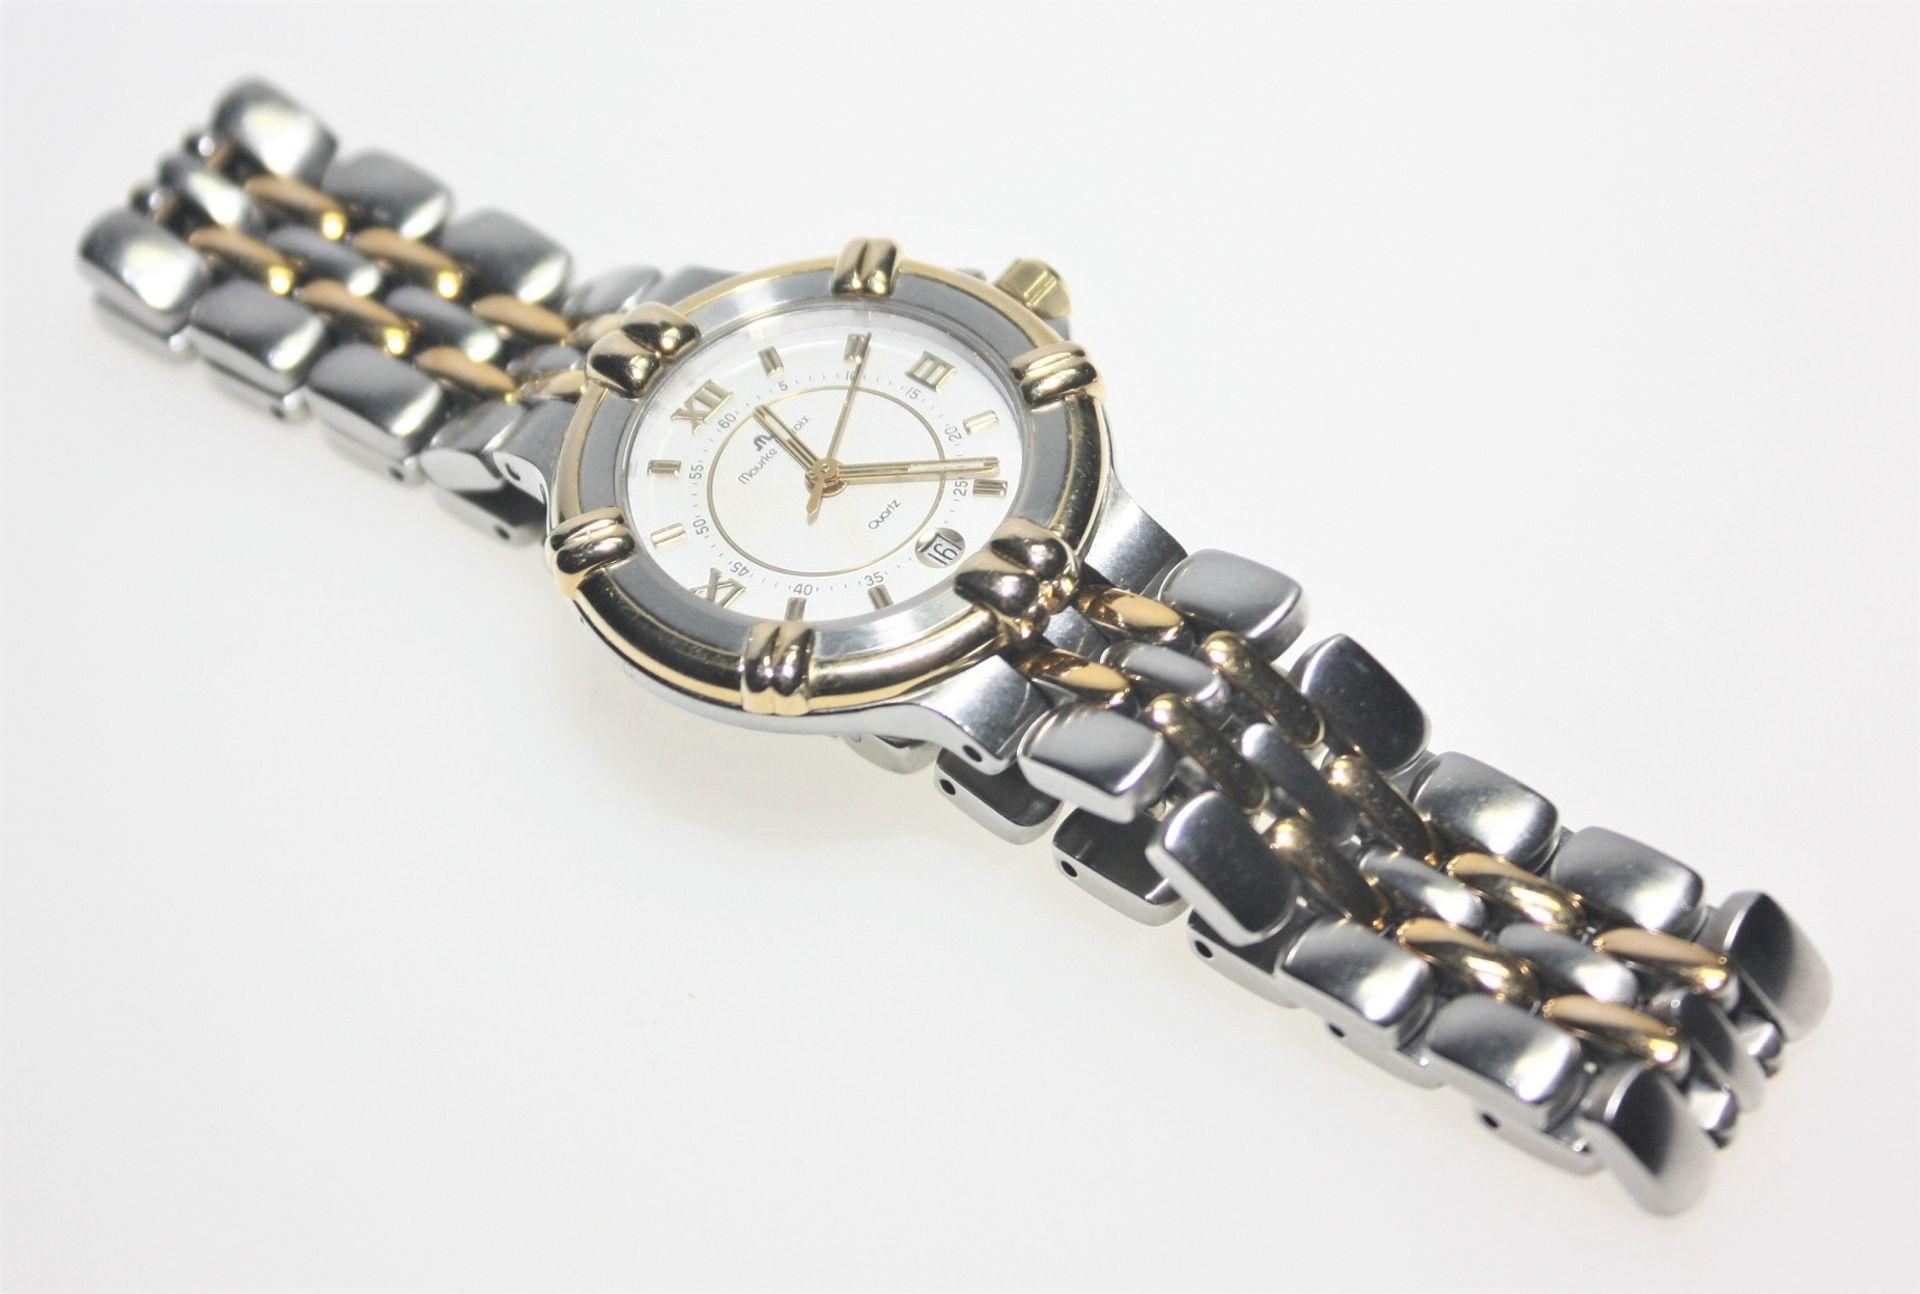 "Moderne Damen-Armbanduhr Stahl/vergoldet ""Maurice la Croix"", Quarz, Datum bei ""6"". Brgw. 56,9 g"